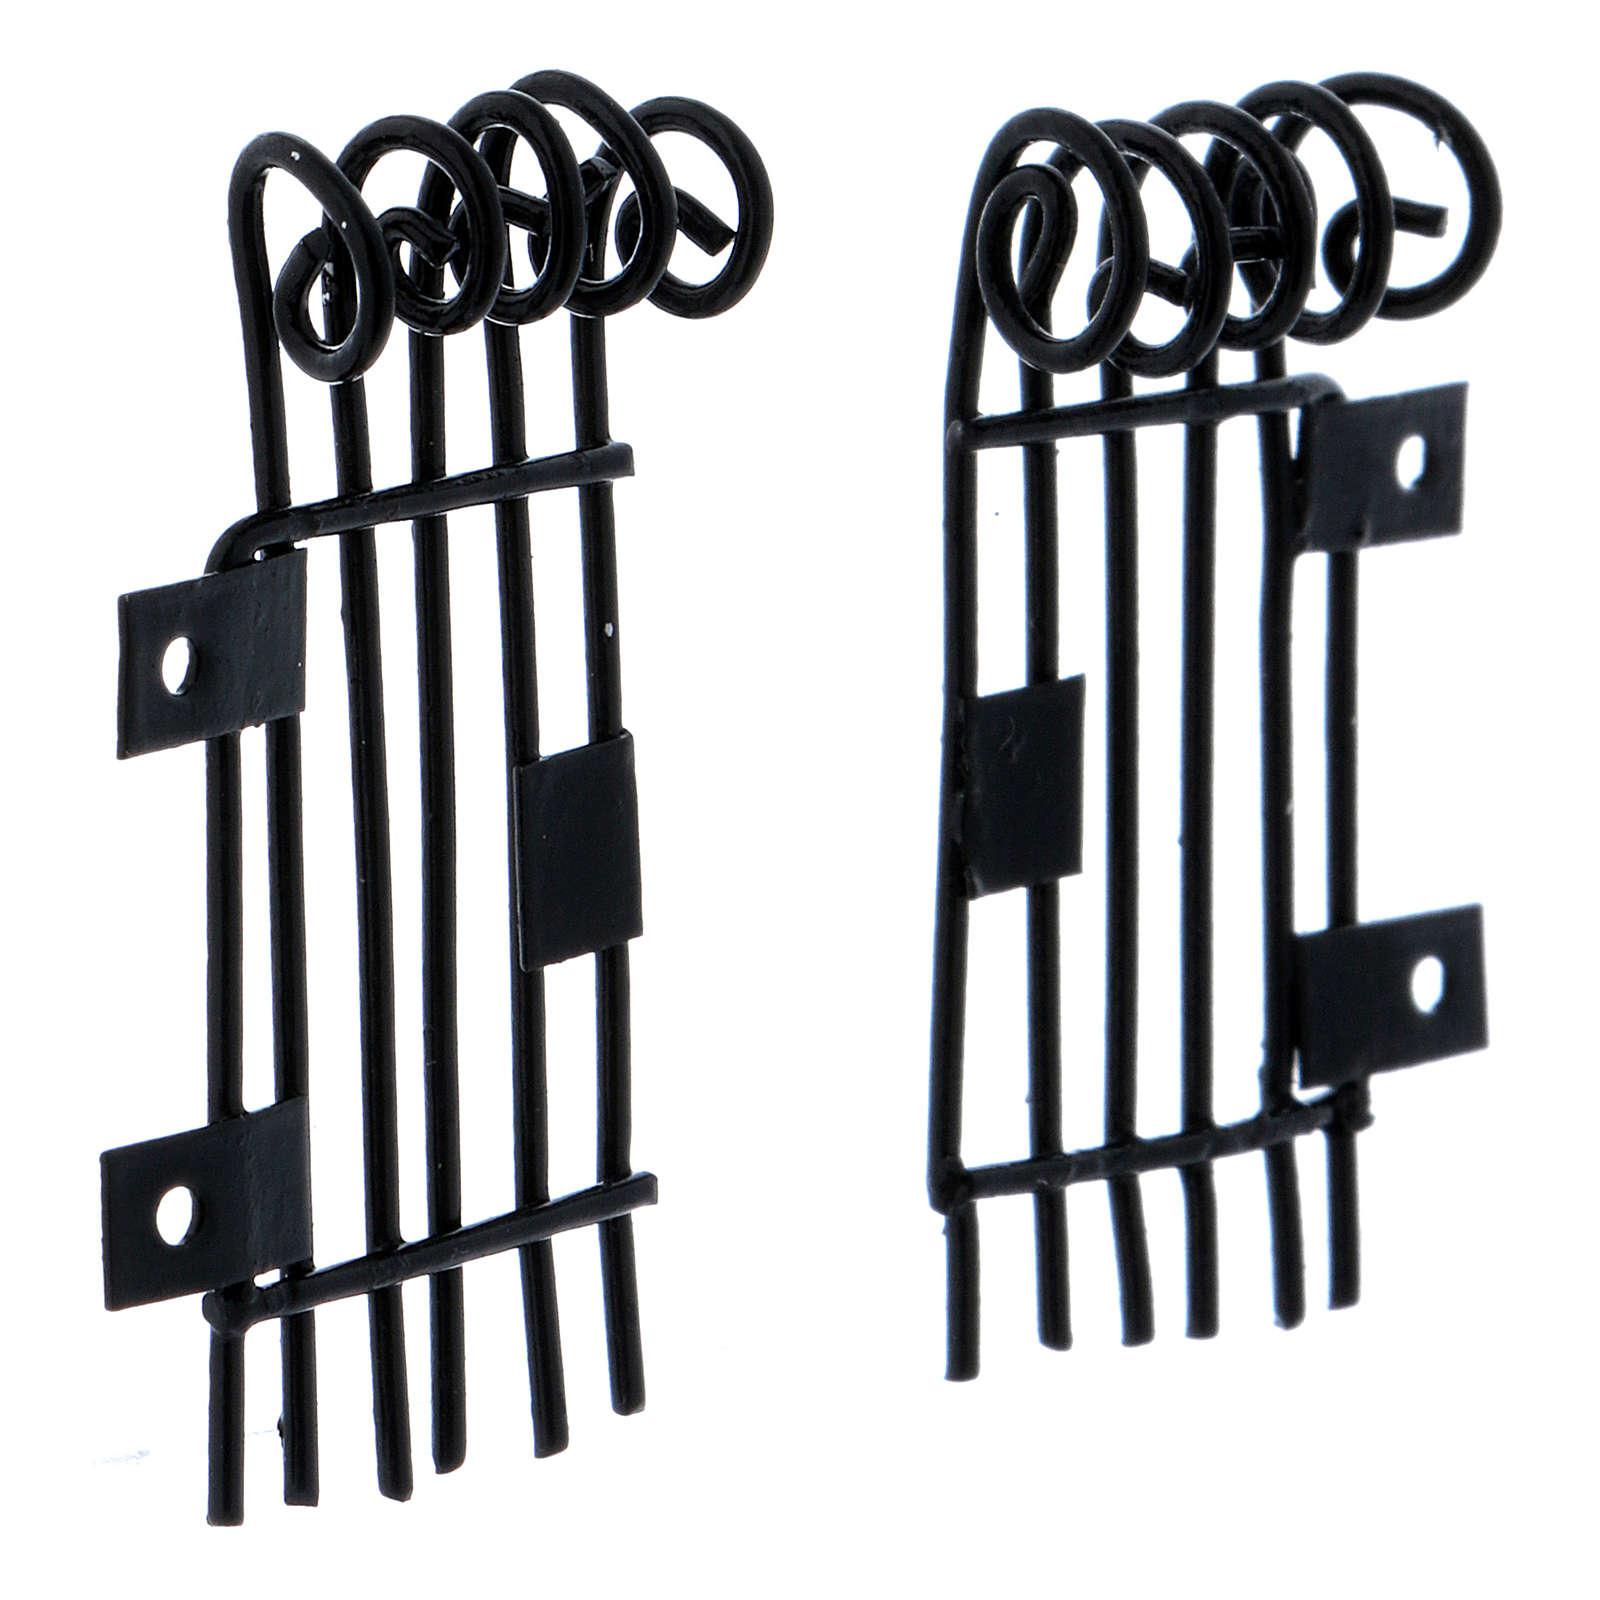 Rectangular openable Railings 3.7 h long 2 cm 4